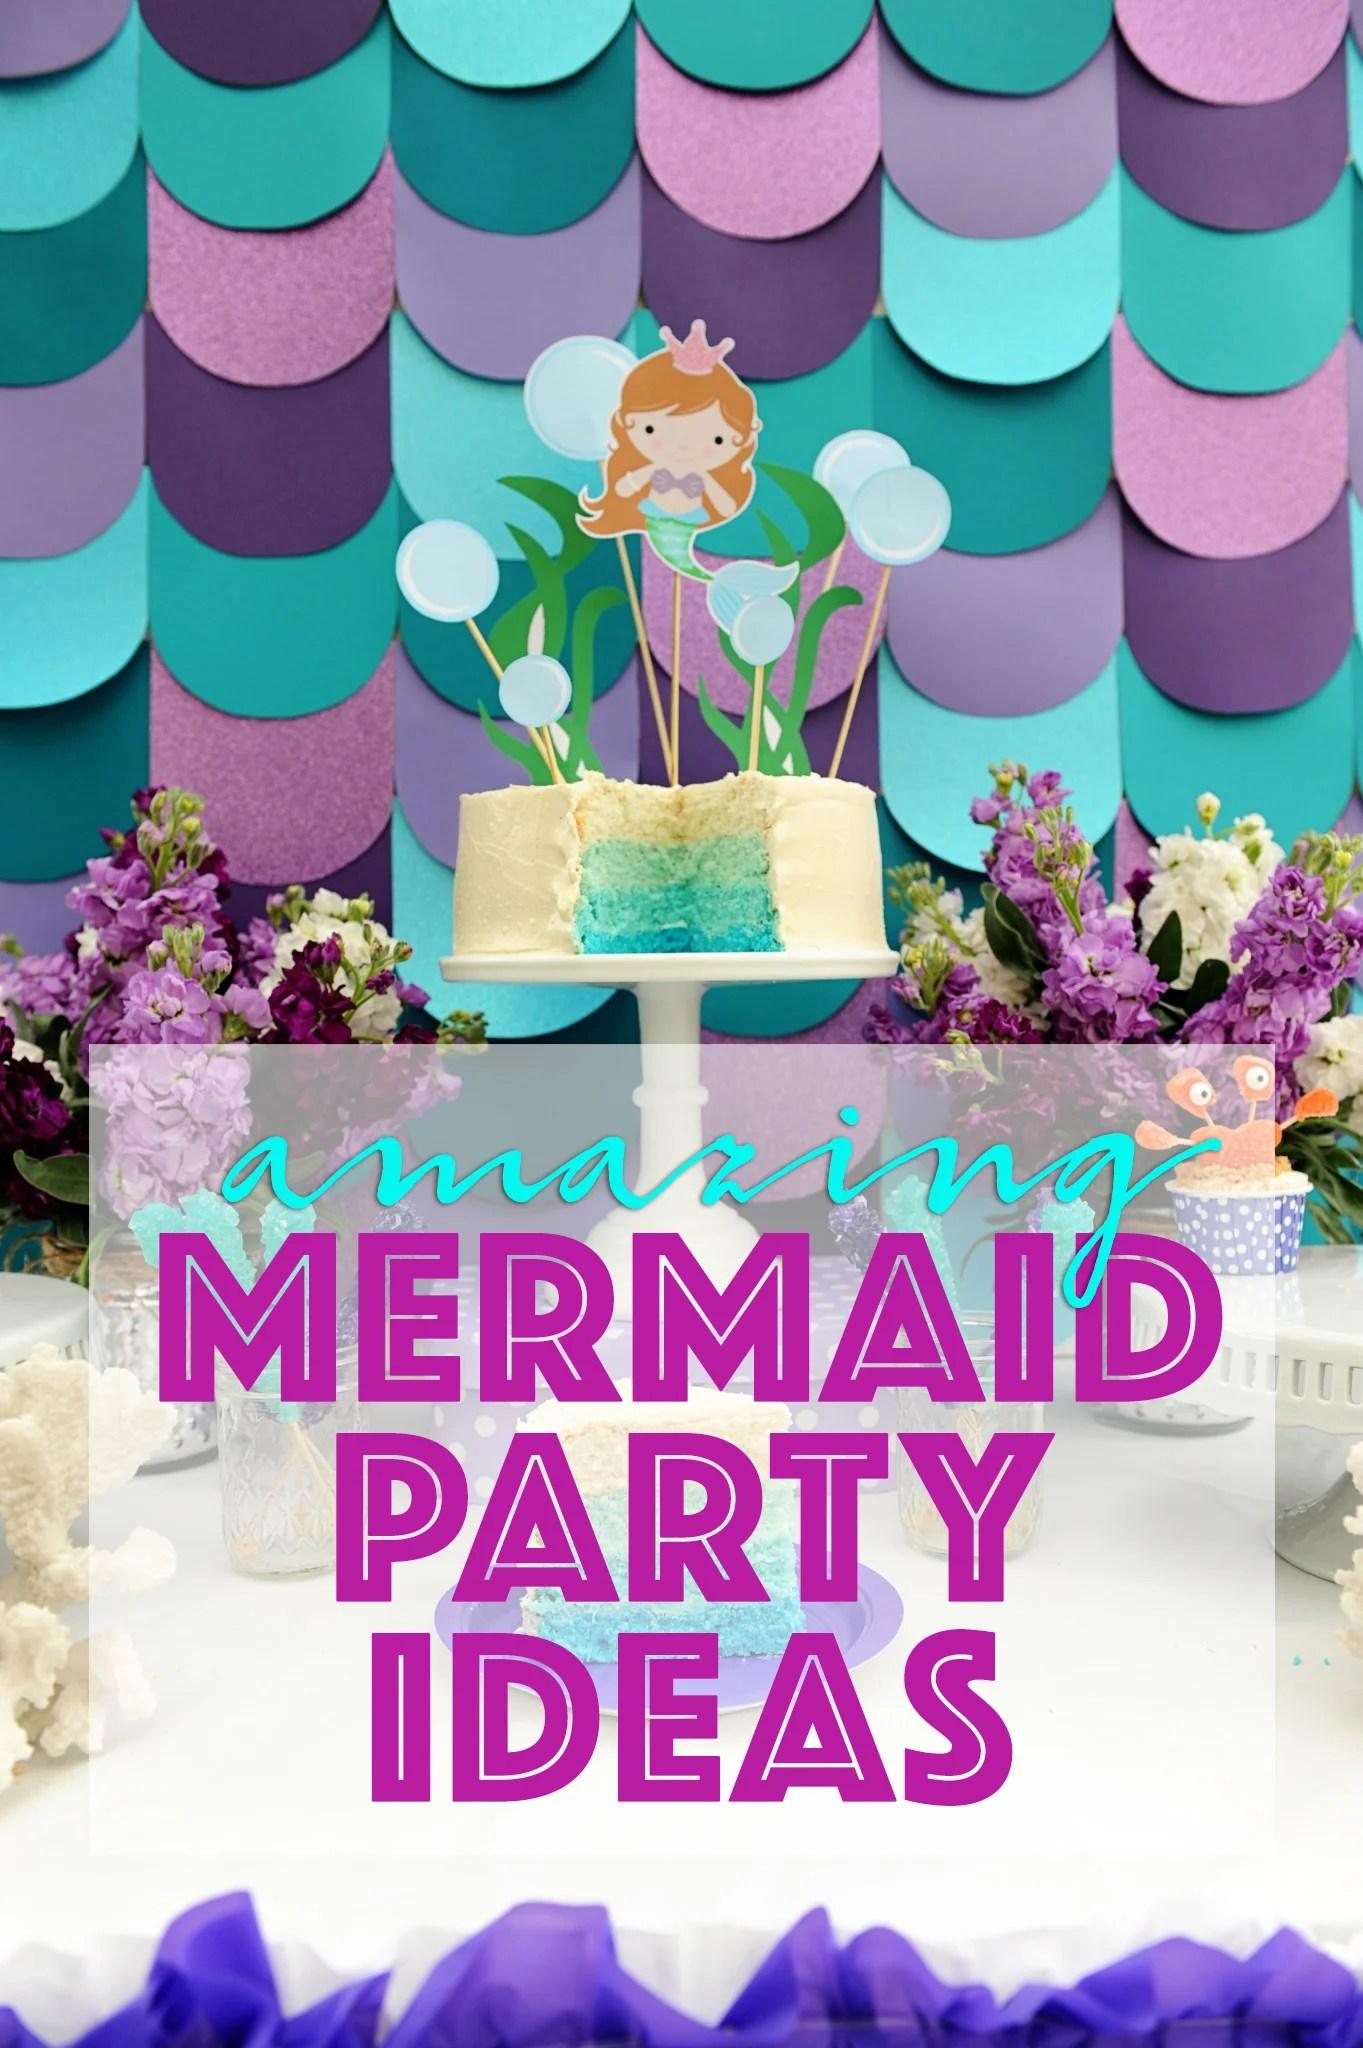 Mermaid Birthday / Pool Party Ideas DIY